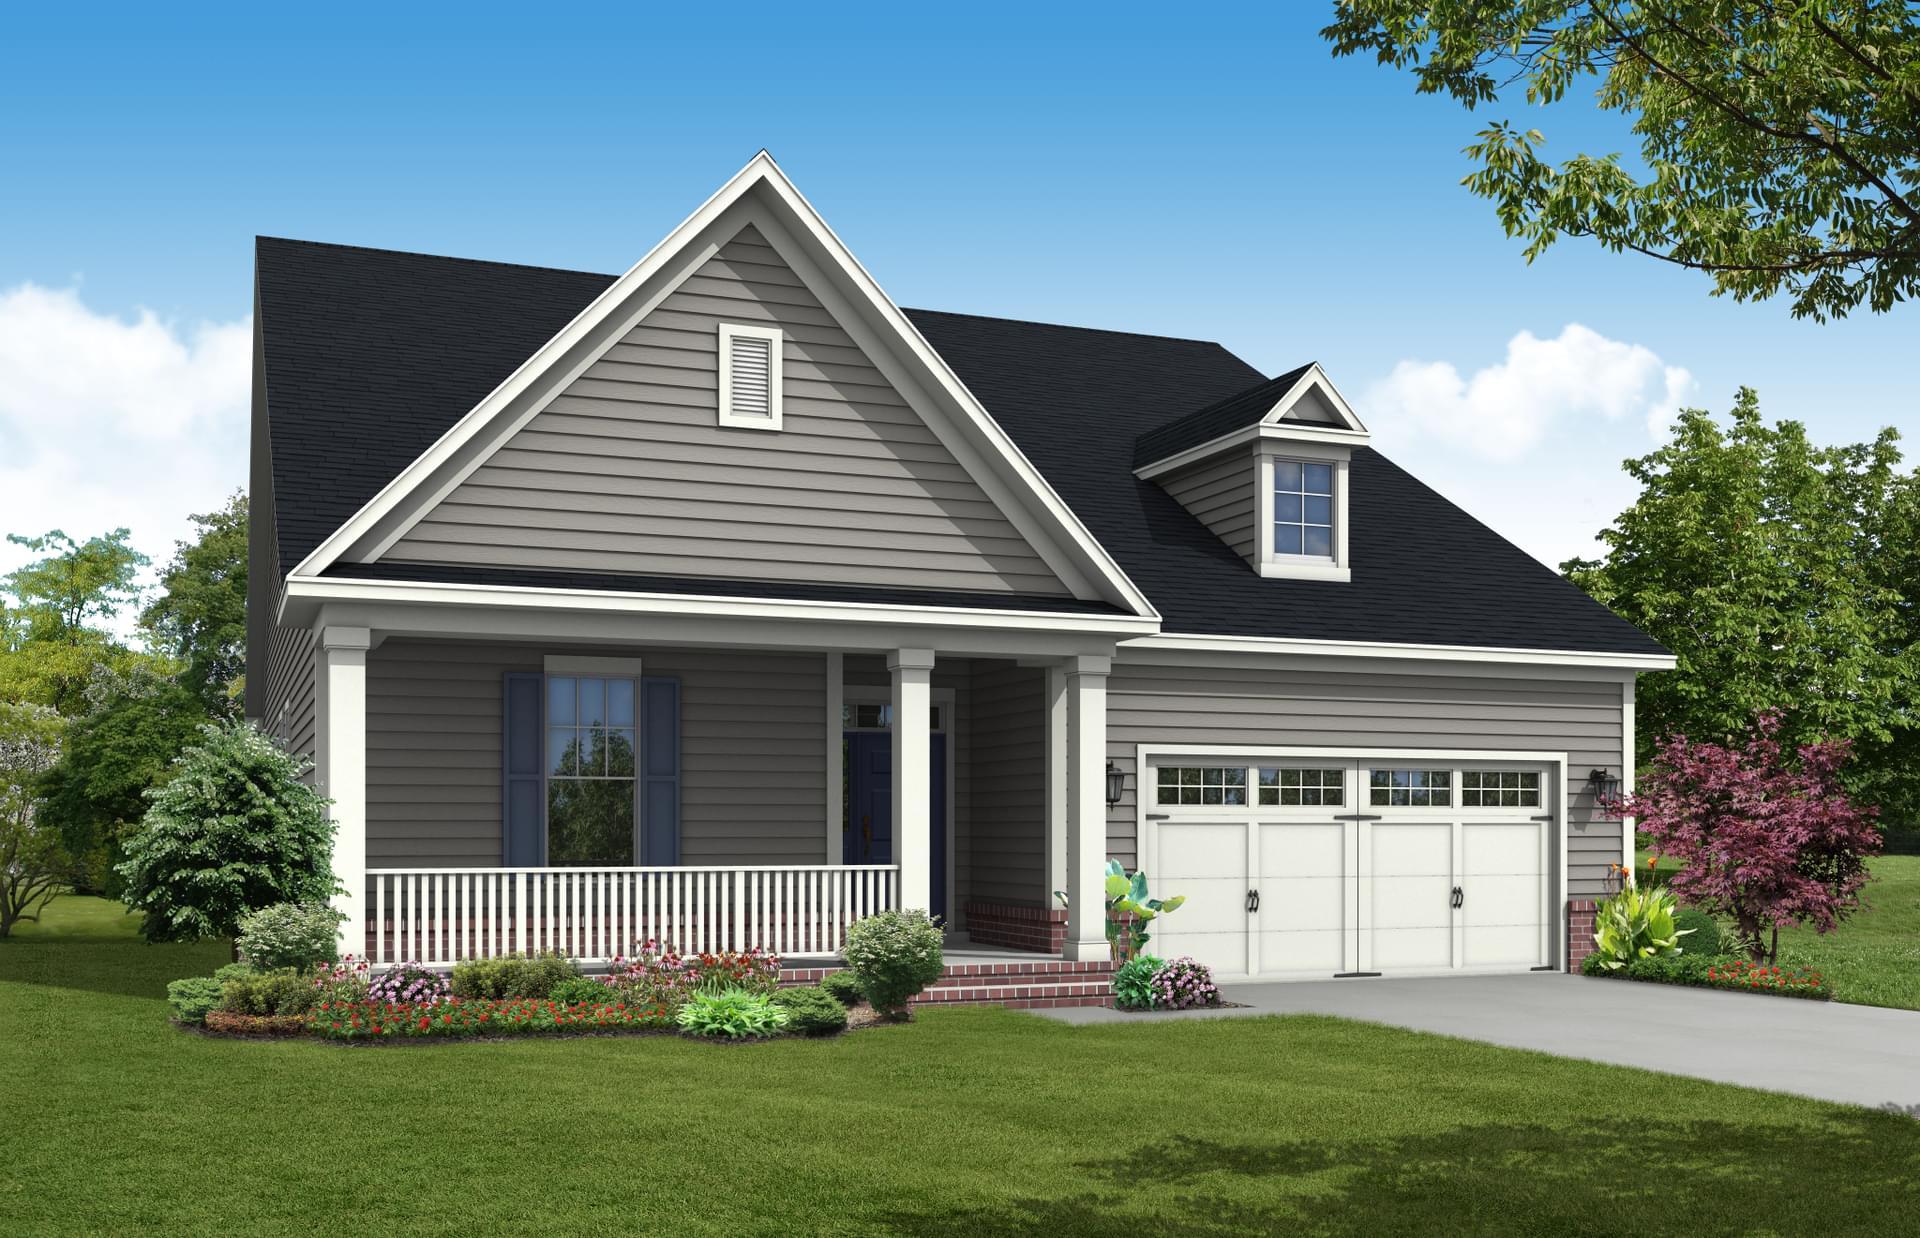 The Corvallis new home in Blacksburg VA